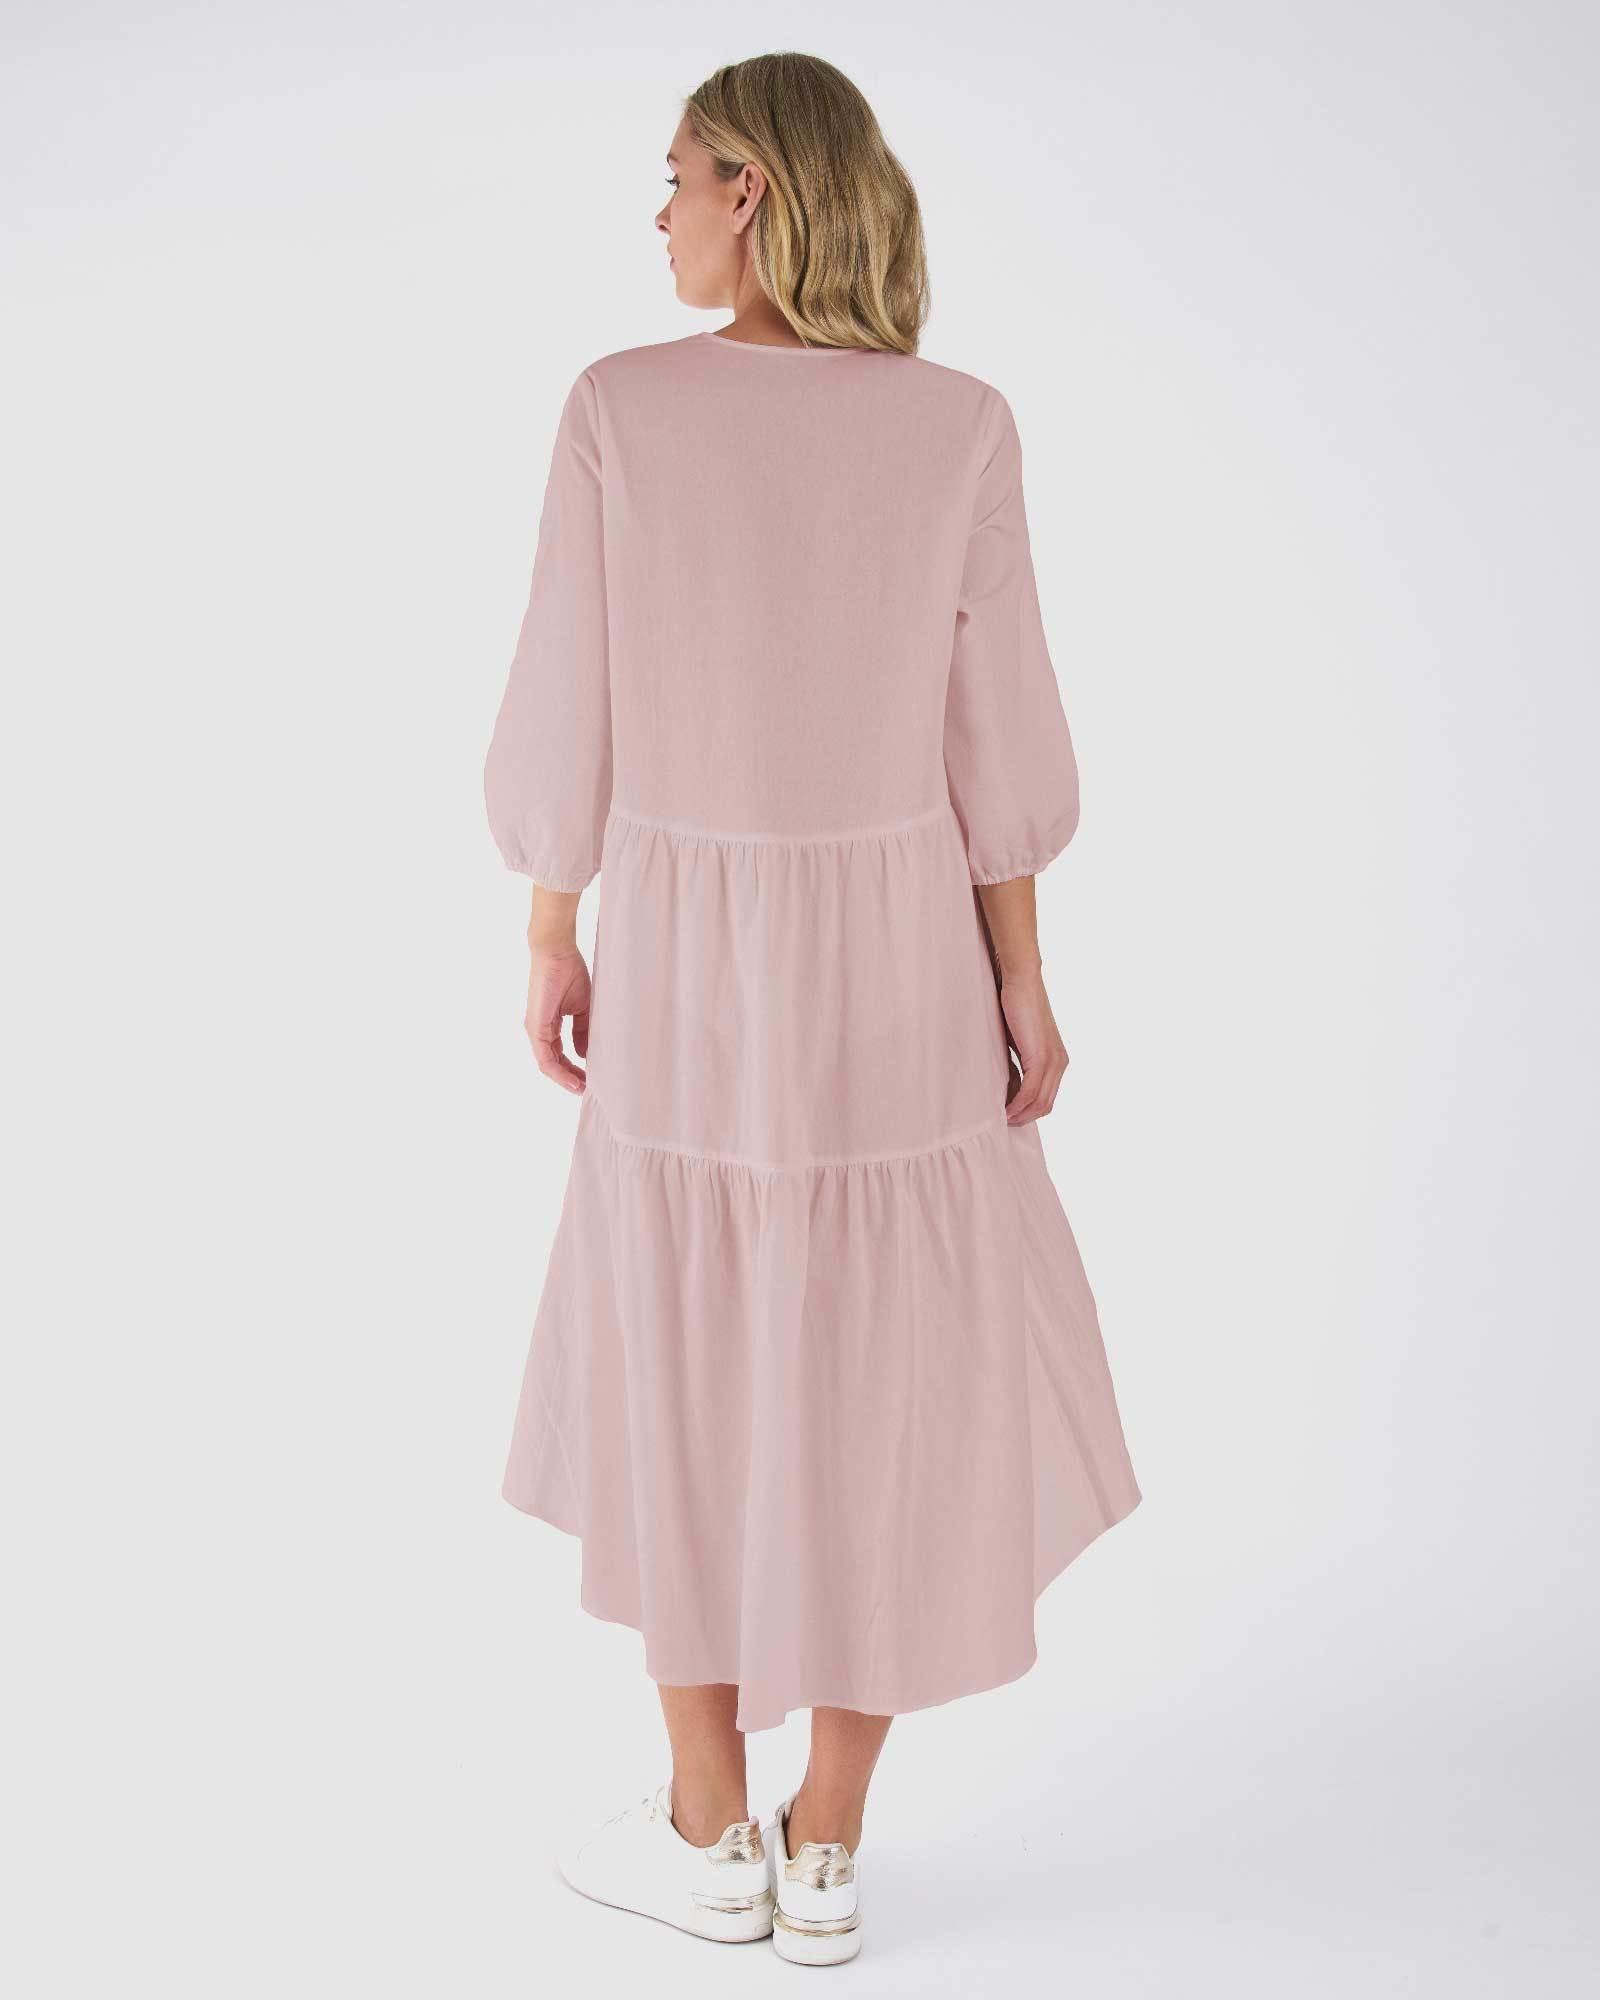 SASS Alice Dress